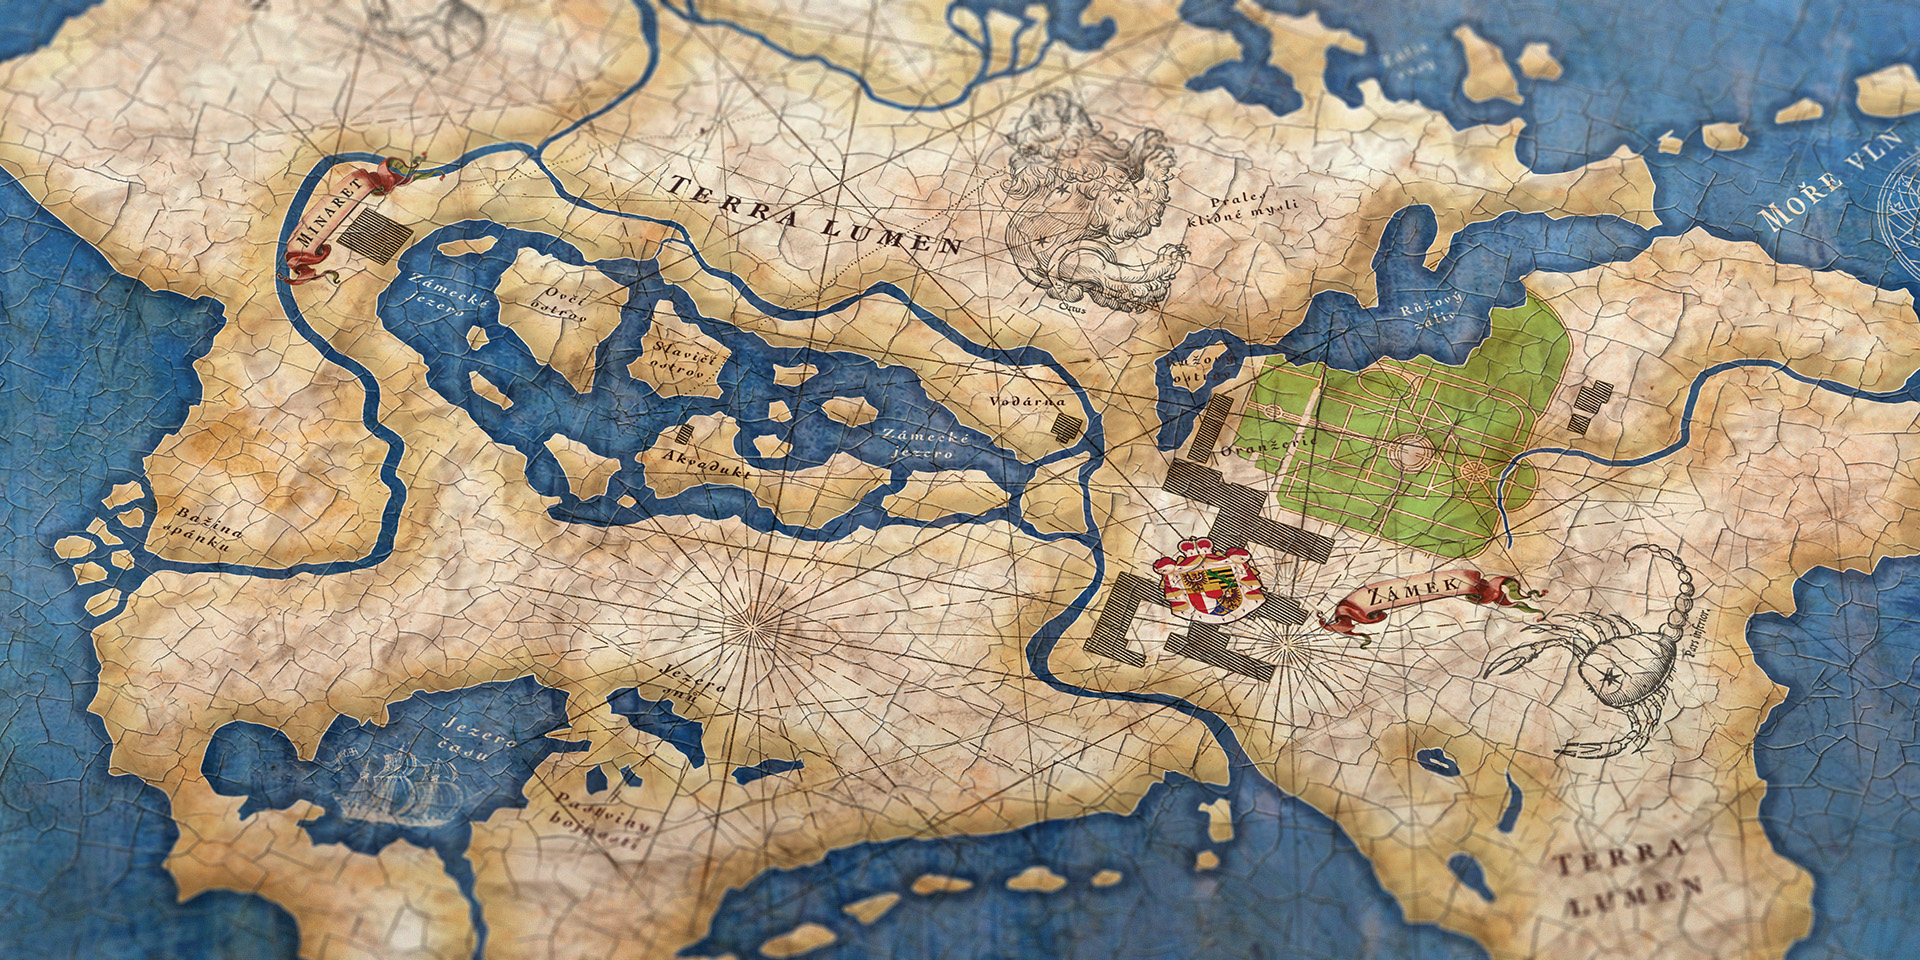 Petr Hlousek Kresba Design Mapy